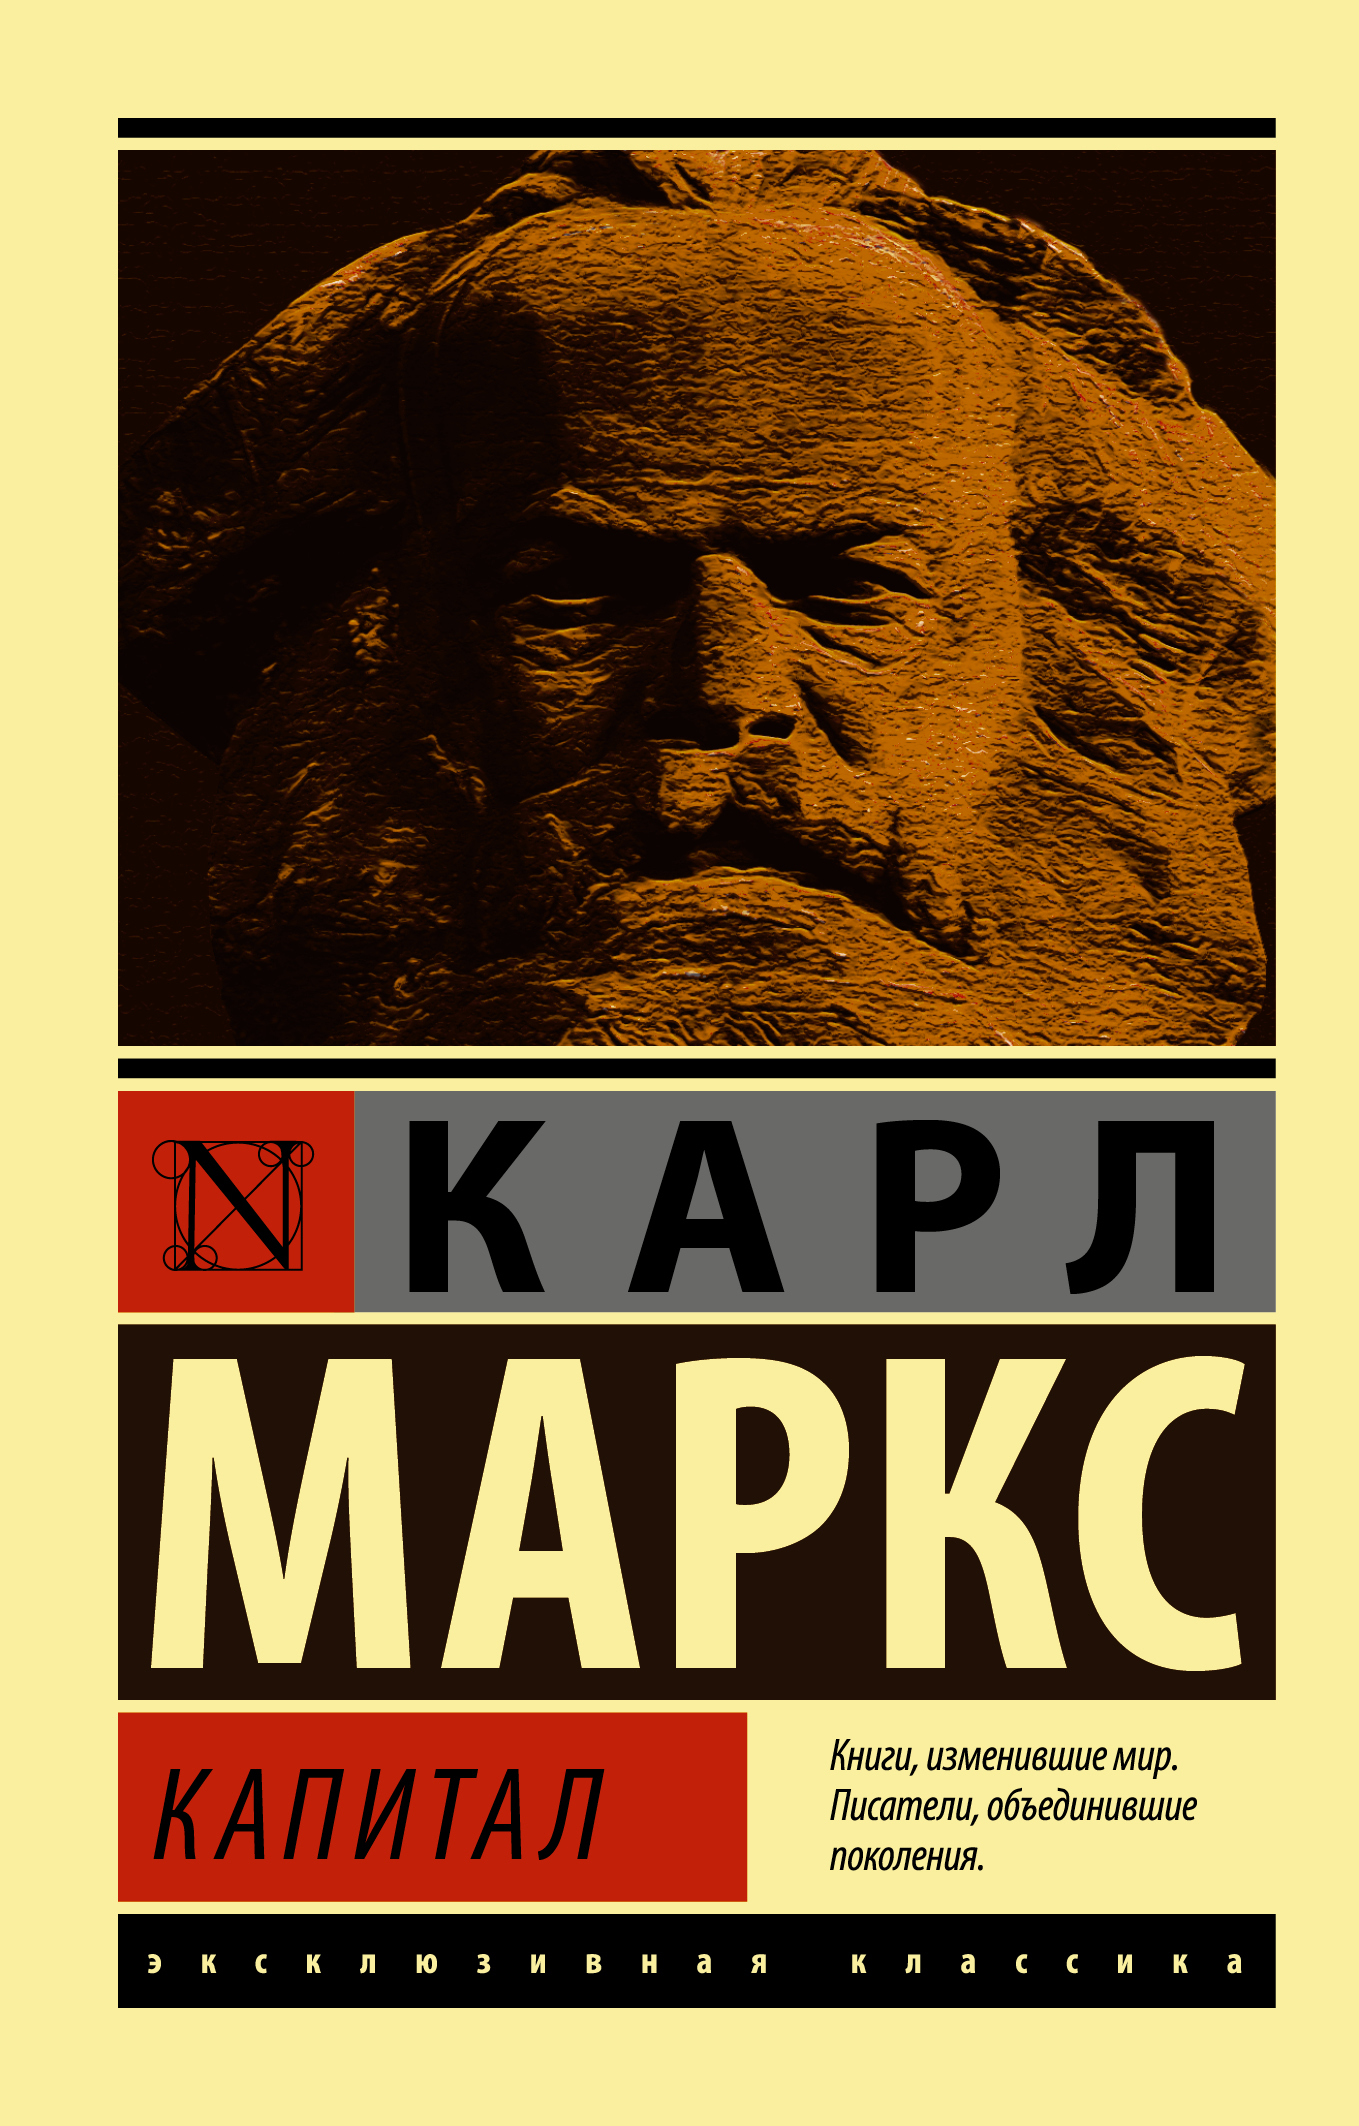 фото книги капитал маркса окружавшим